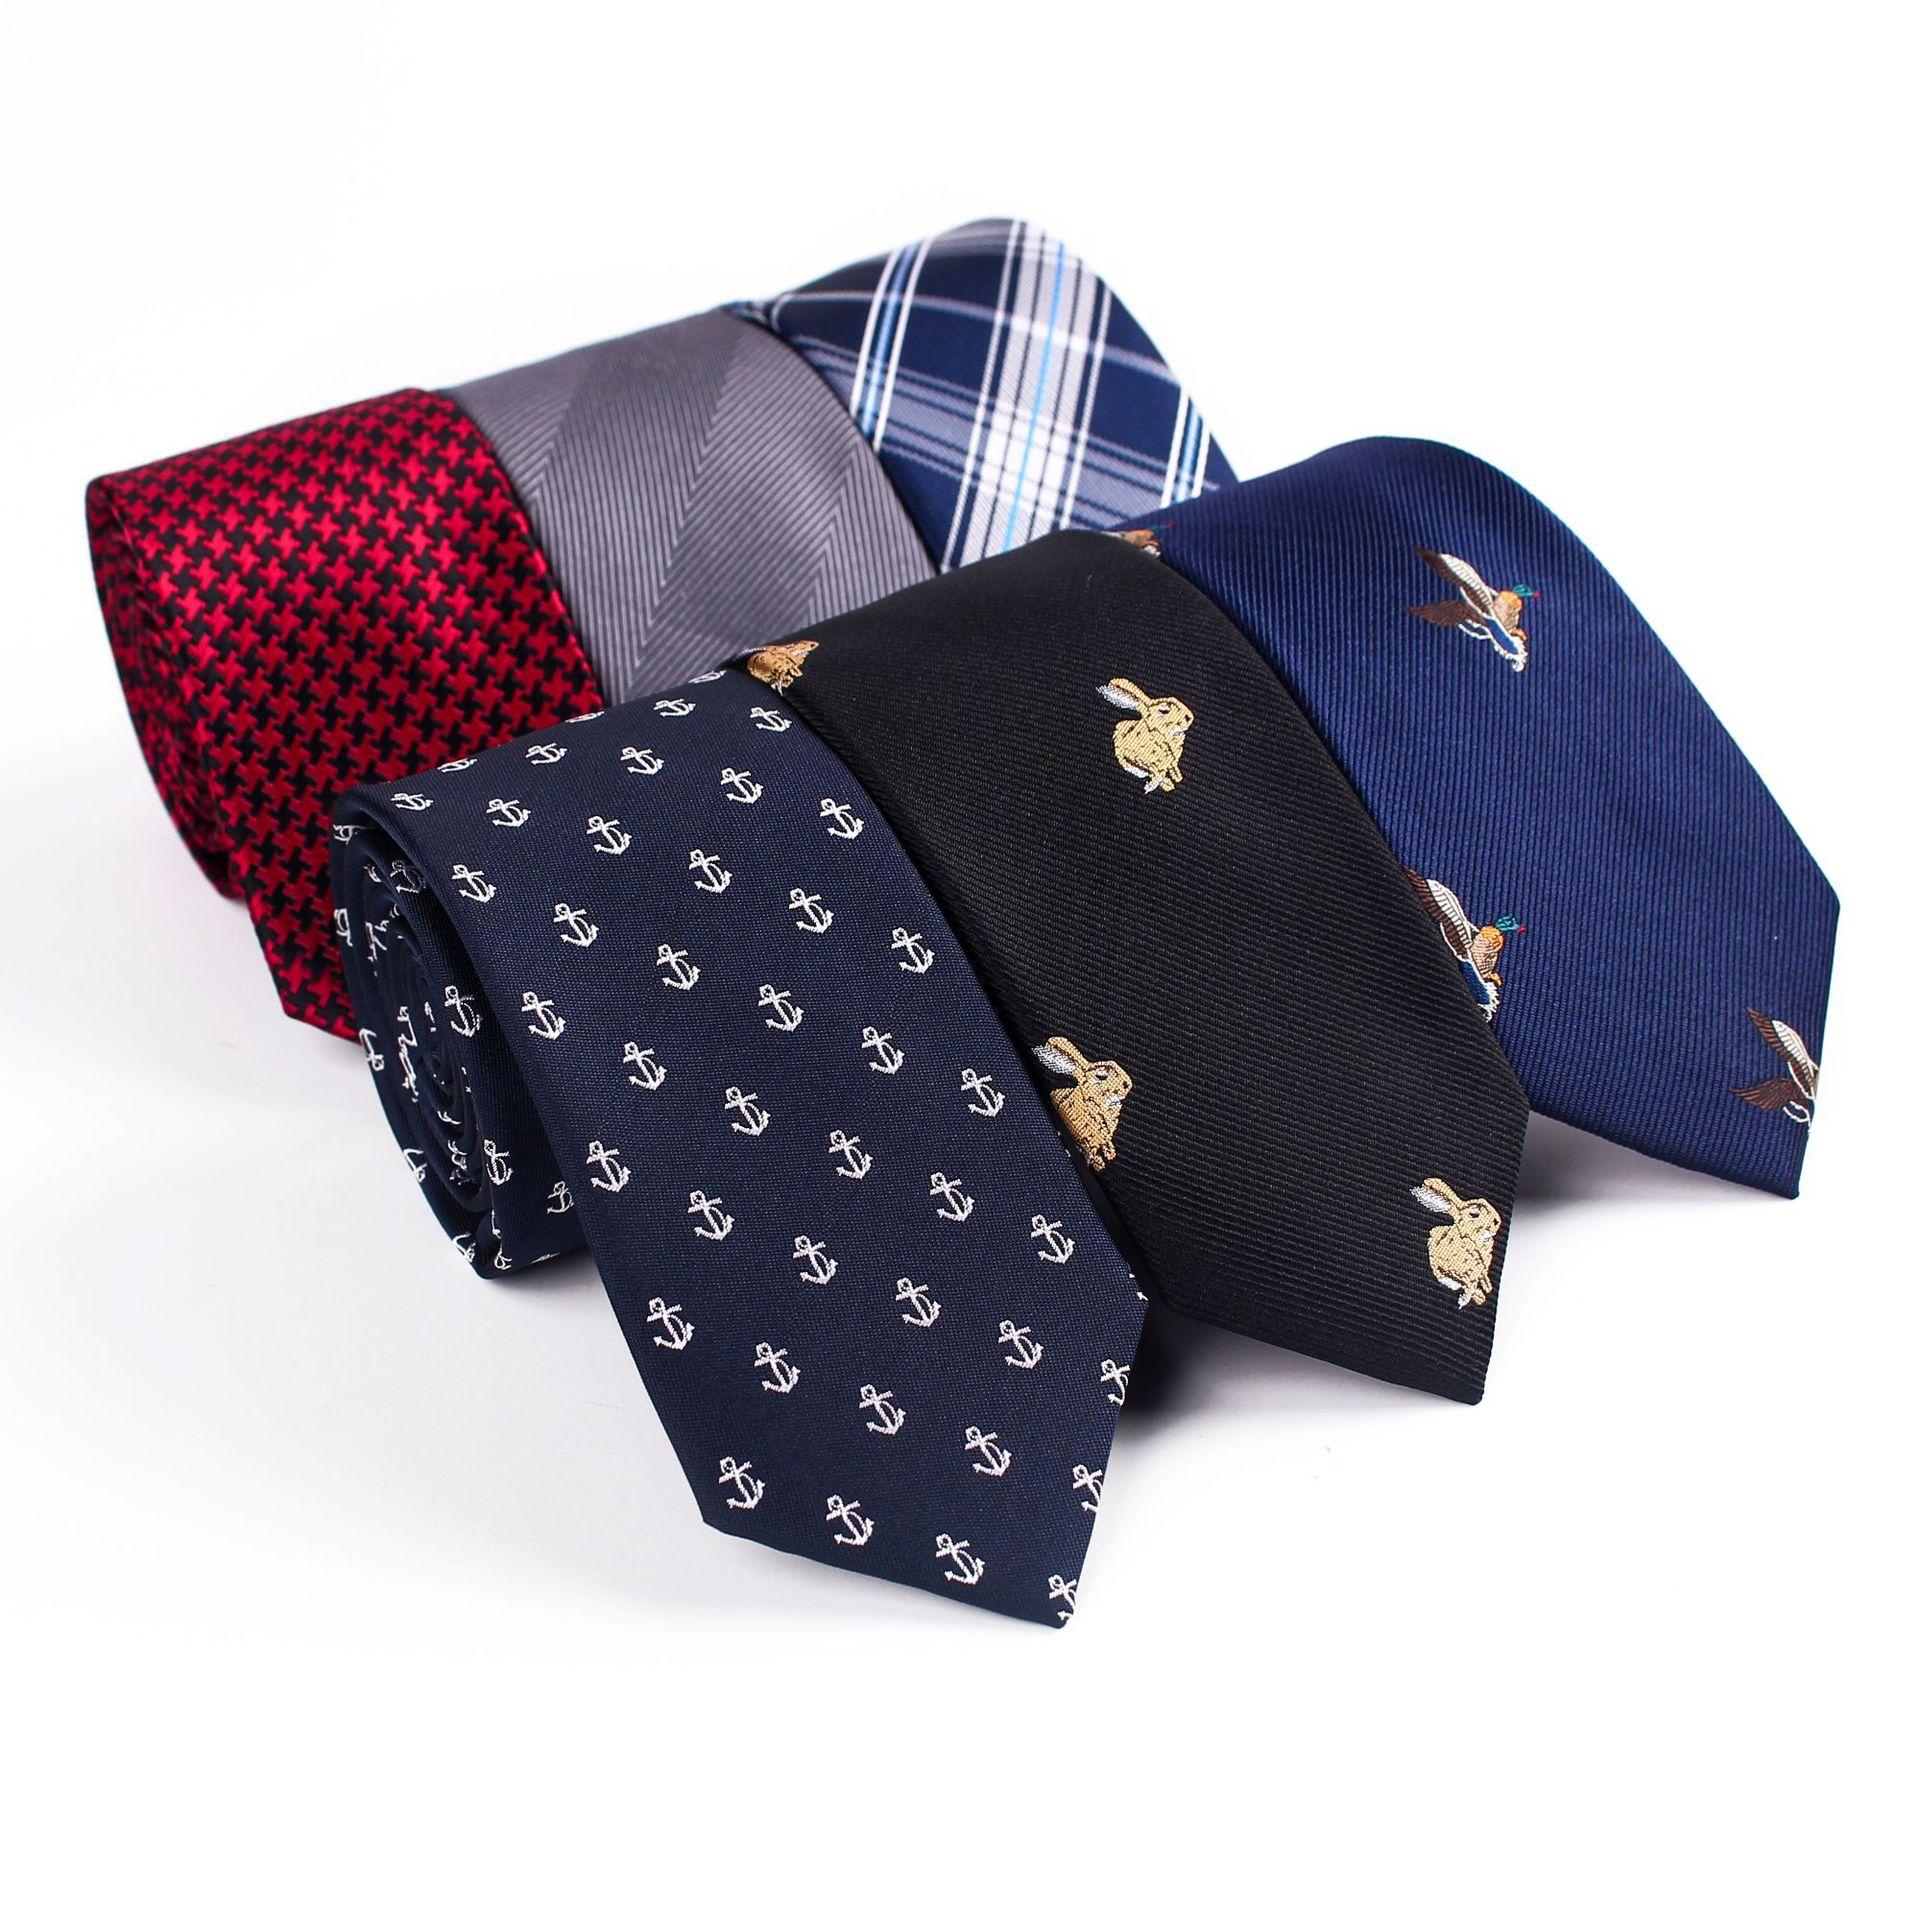 Mantieqingway 6cm Mens Ties New Man Fashion Rabbit Neckties Corbatas Gravata Jacquard Slim Tie Business Green Black Tie For Men